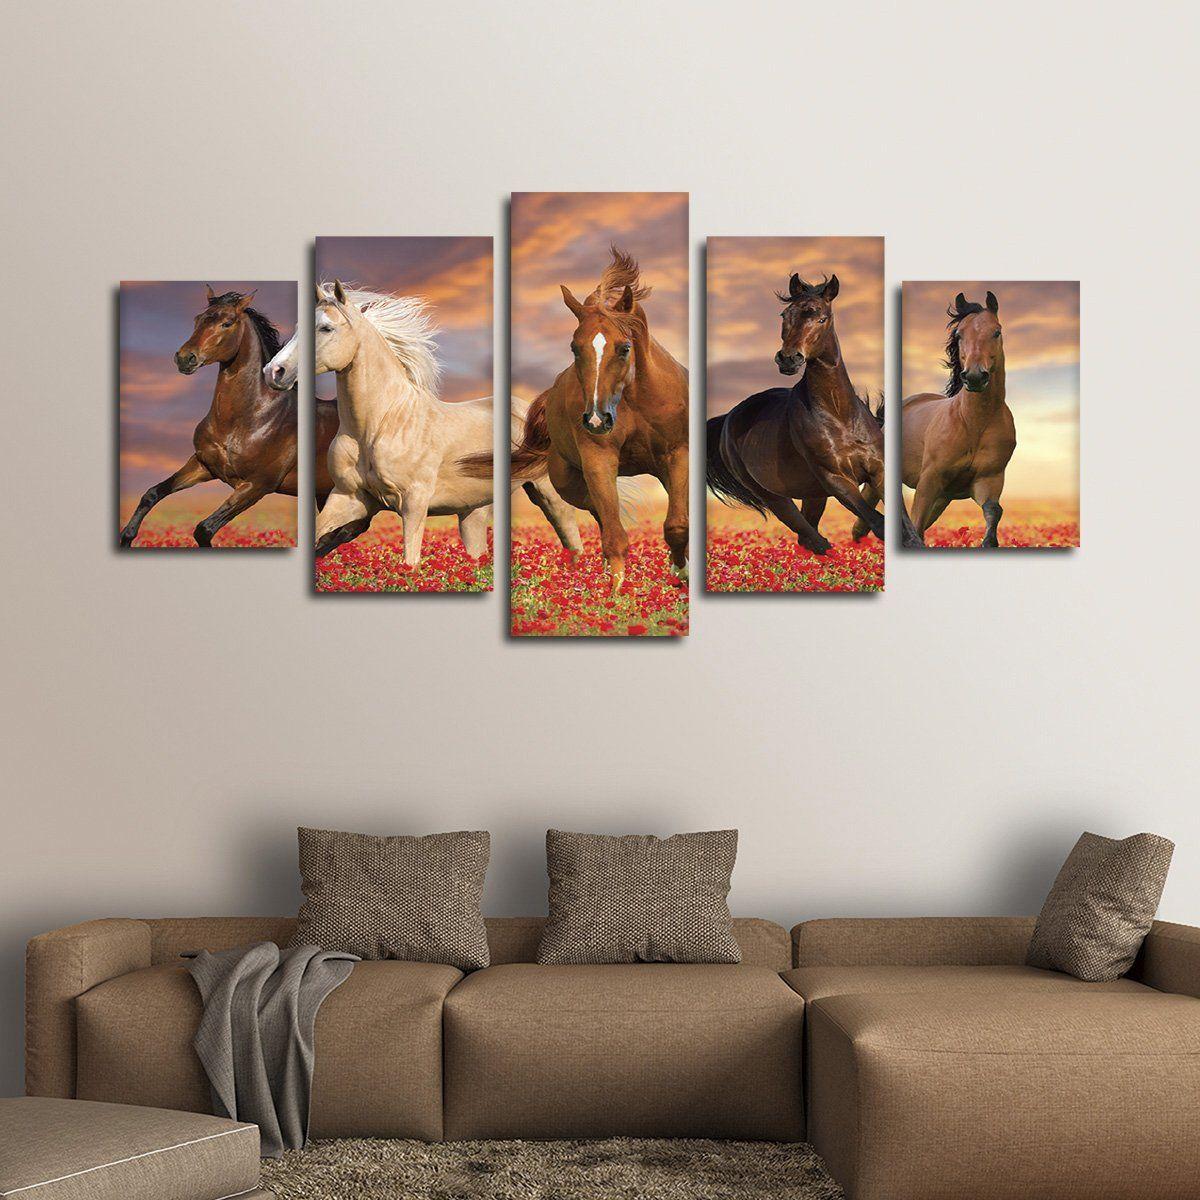 Mustang Horses Wall Art In 2020 Horse Wall Art Animal Wall Art Canvas Wall Art